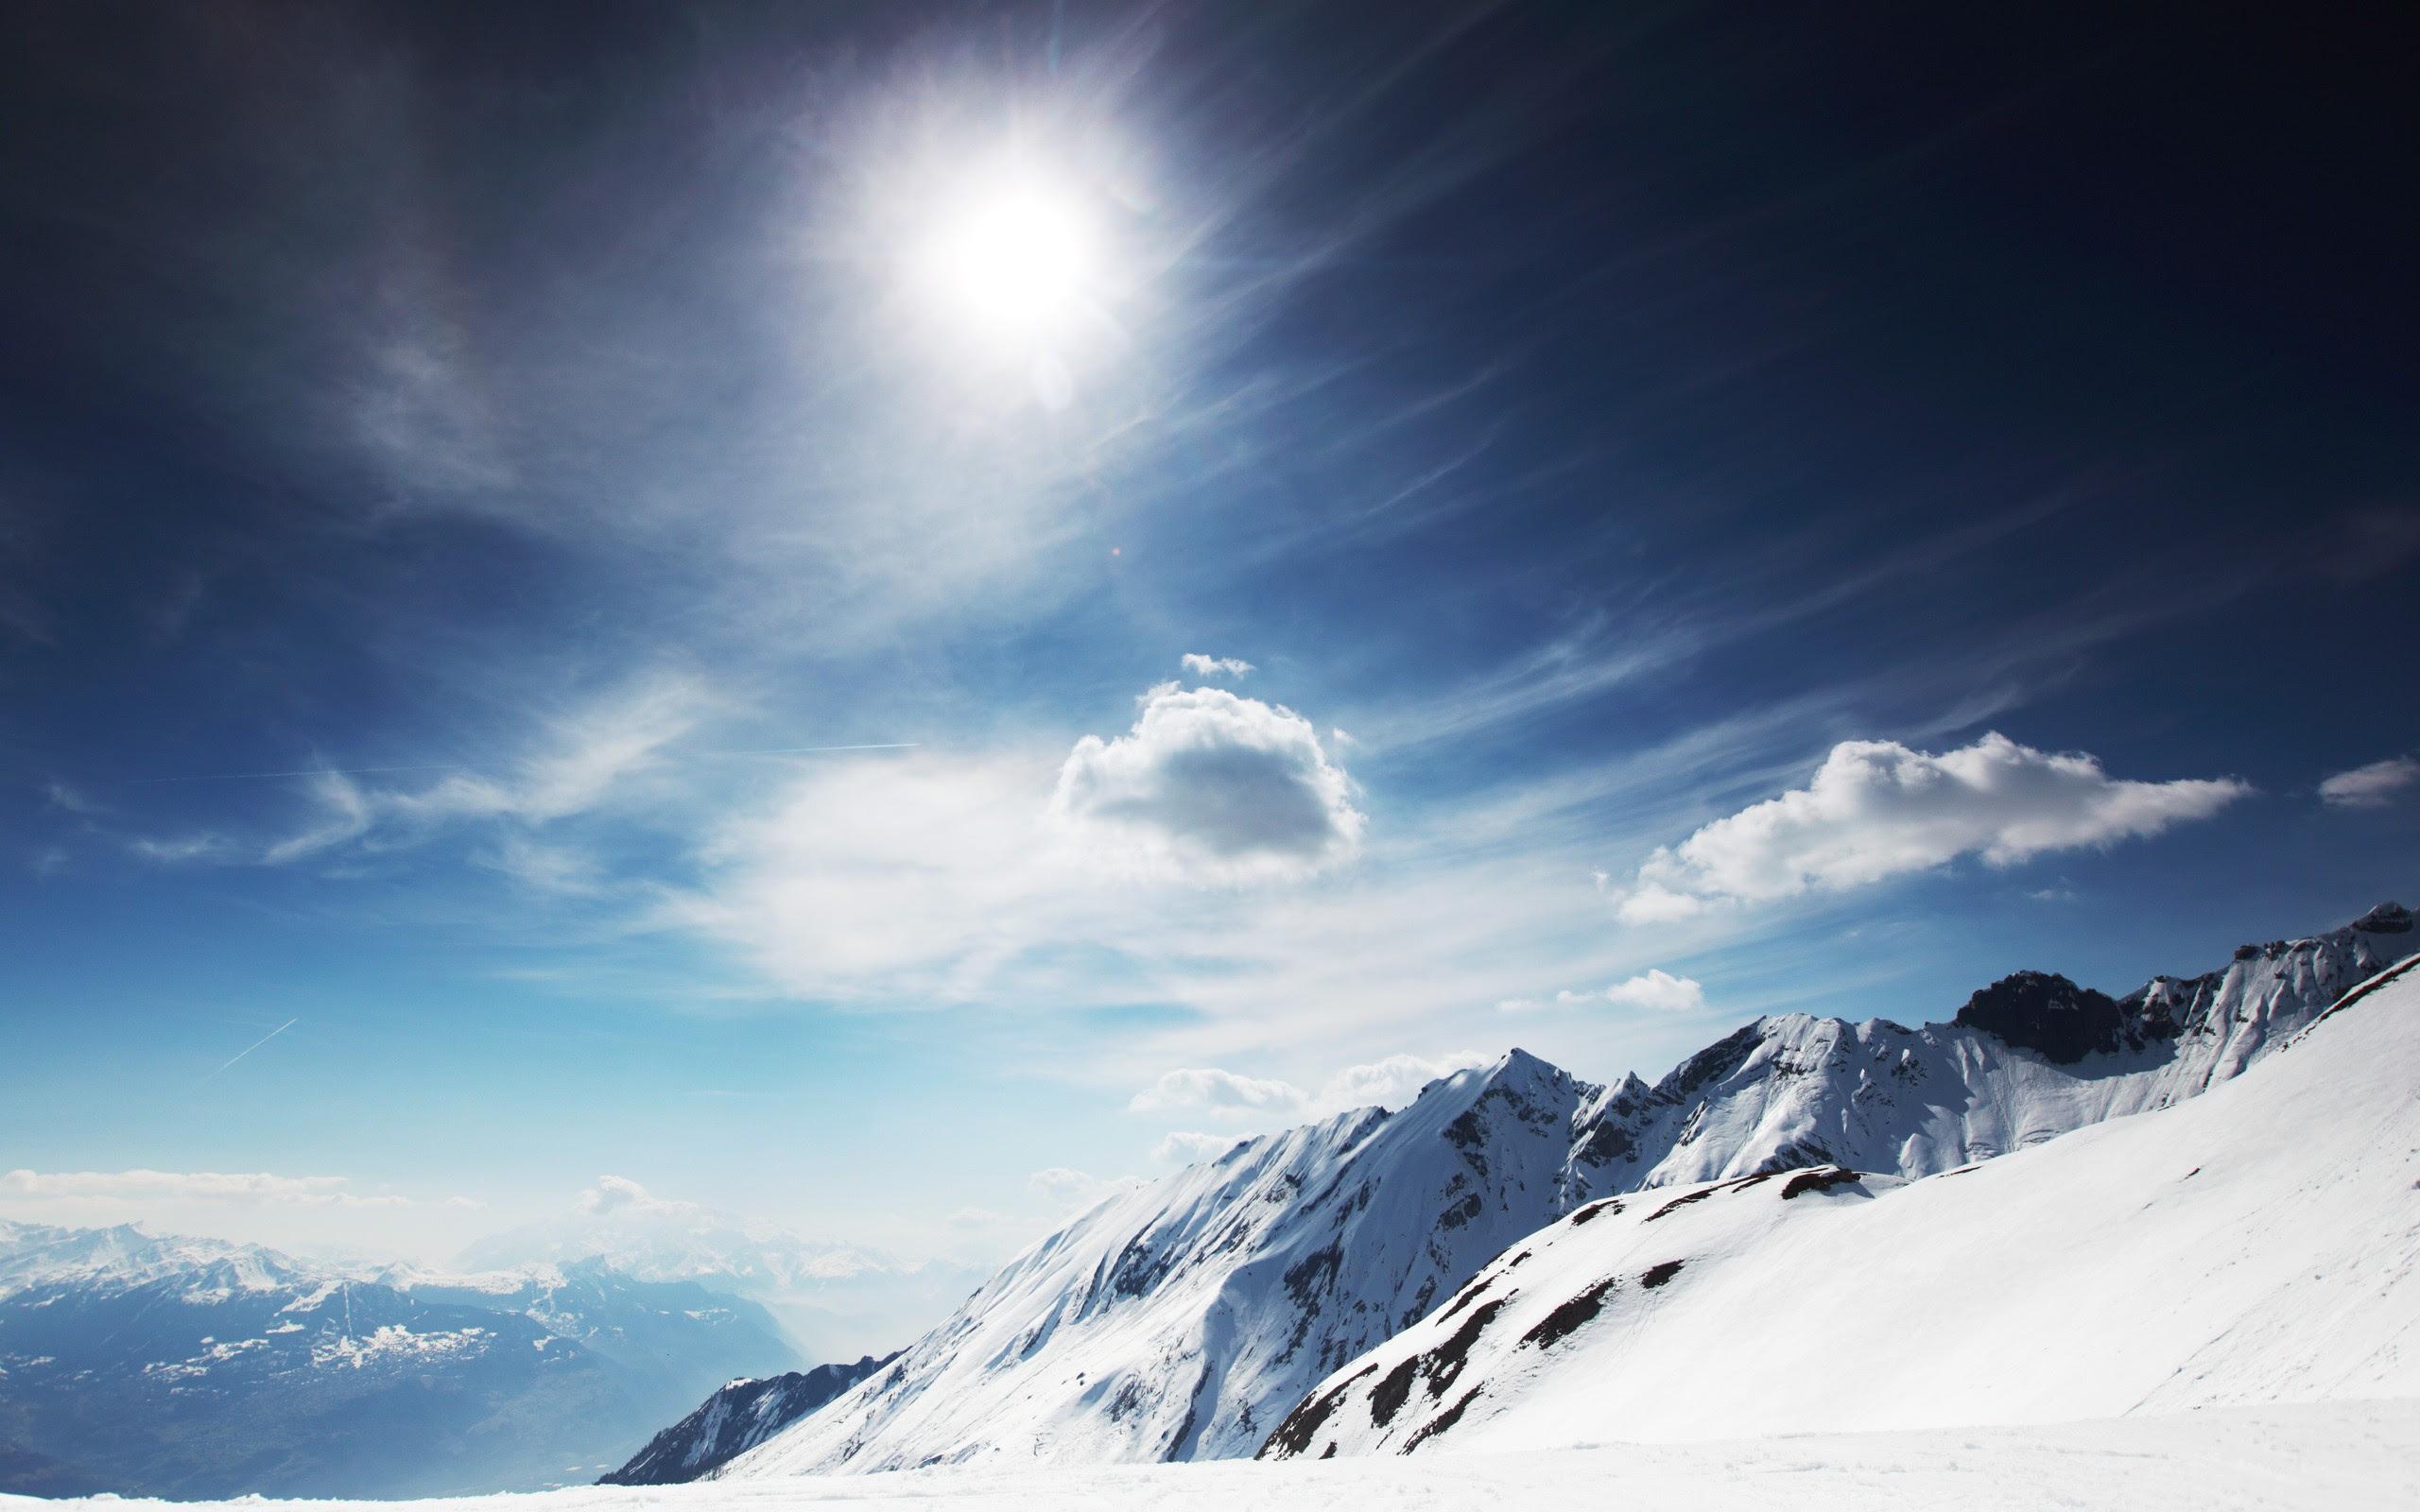 Snow Mountain Wallpaper 2560x1600 79834